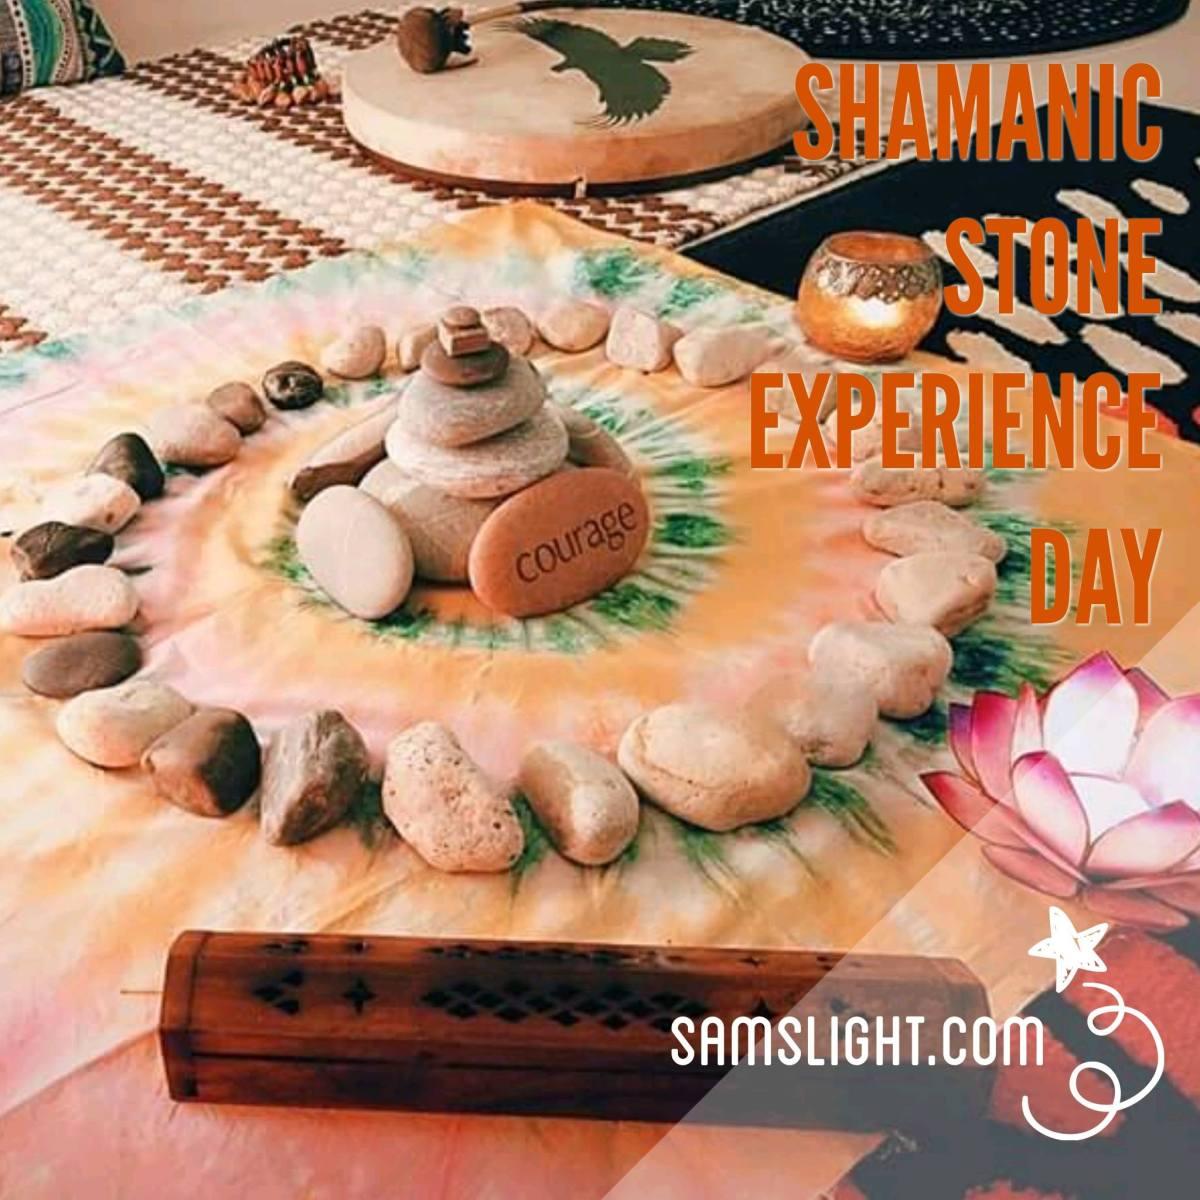 Shamanic 薩滿石頭占卜及石頭治療~2019生命藍圖閱讀體驗日